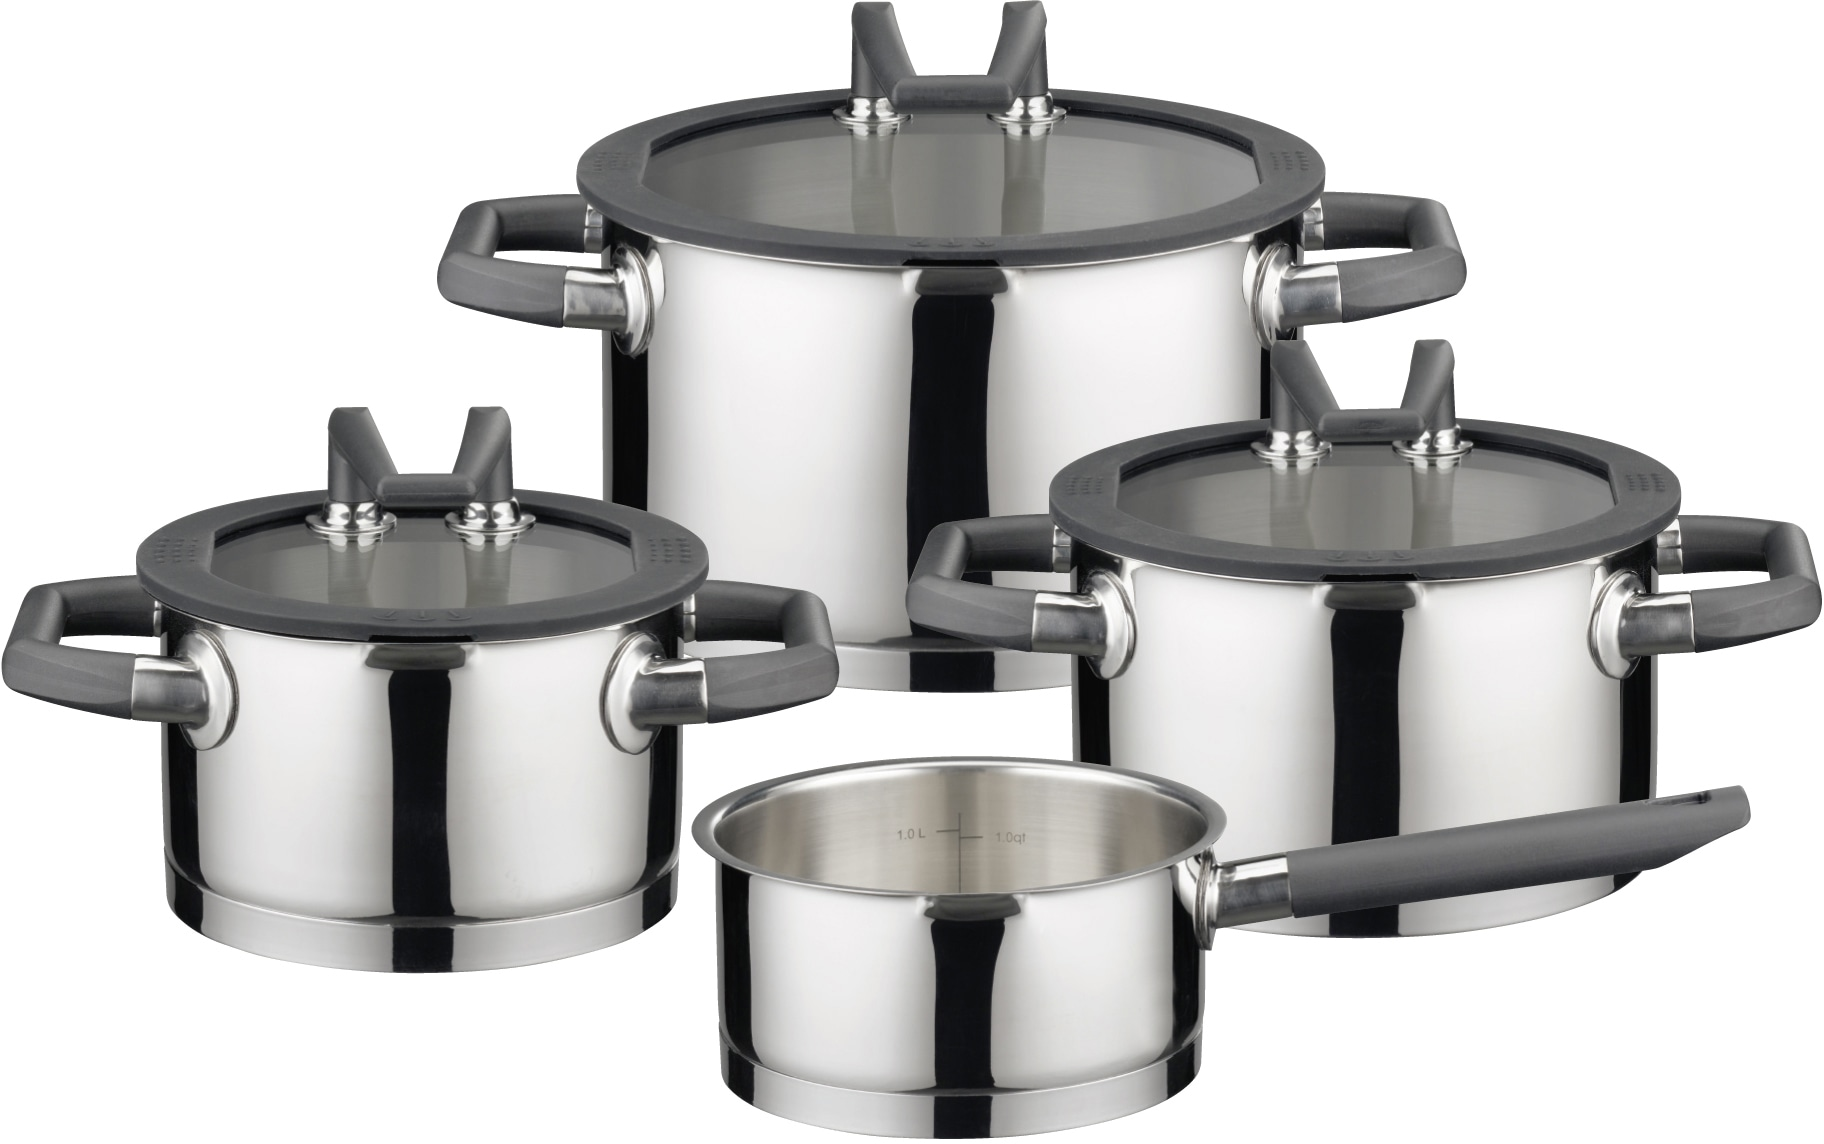 Elo Premium Topf-Set Black Pearl (Set 7-tlg) Wohnen/Haushalt/Haushaltswaren/Töpfe/Topfsets